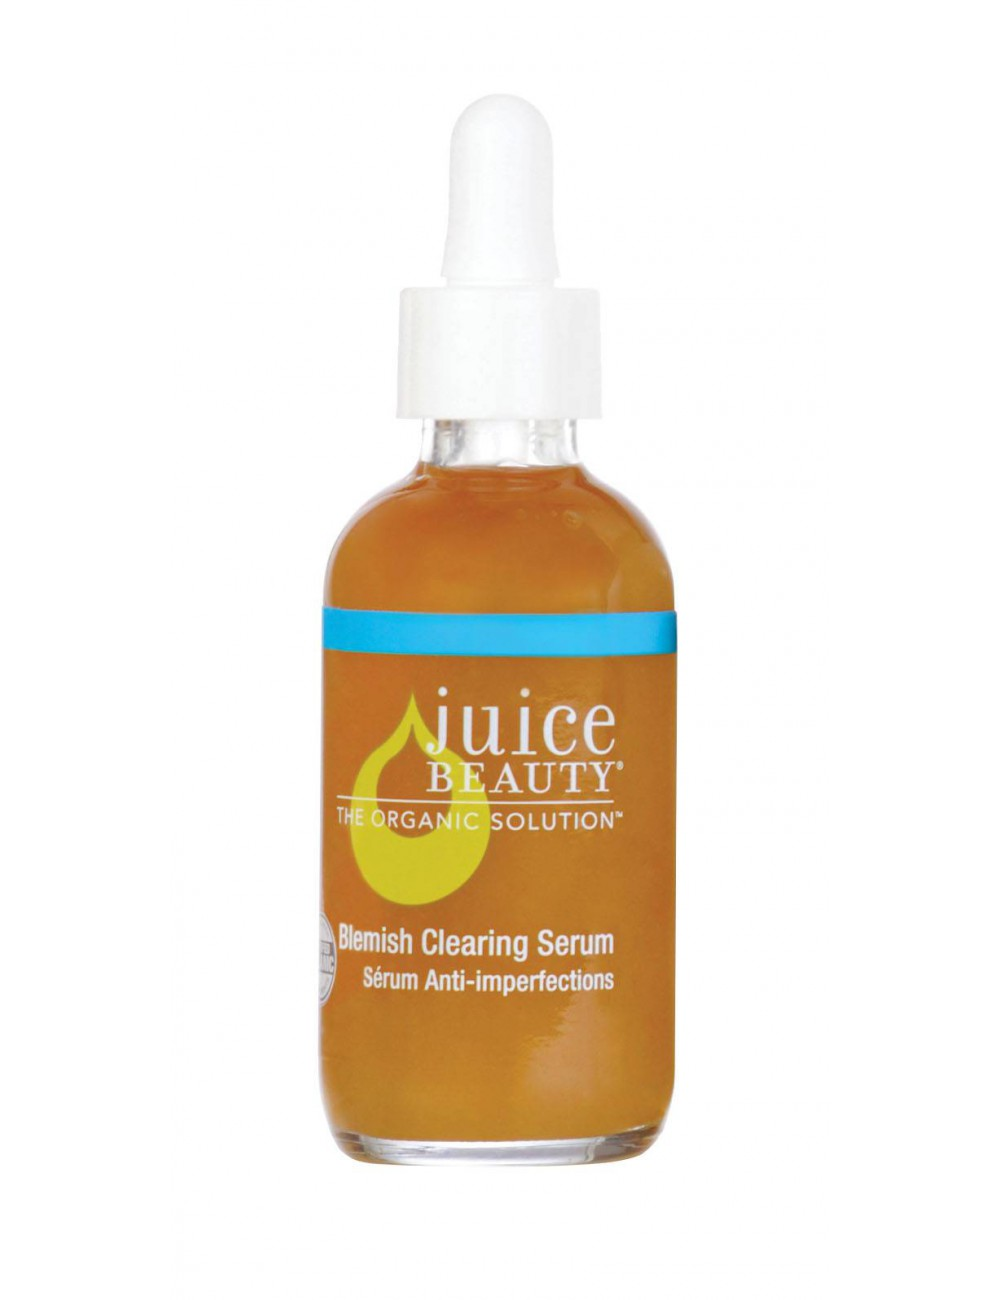 Juice Beauty Blemish Clearing Serum 60ml